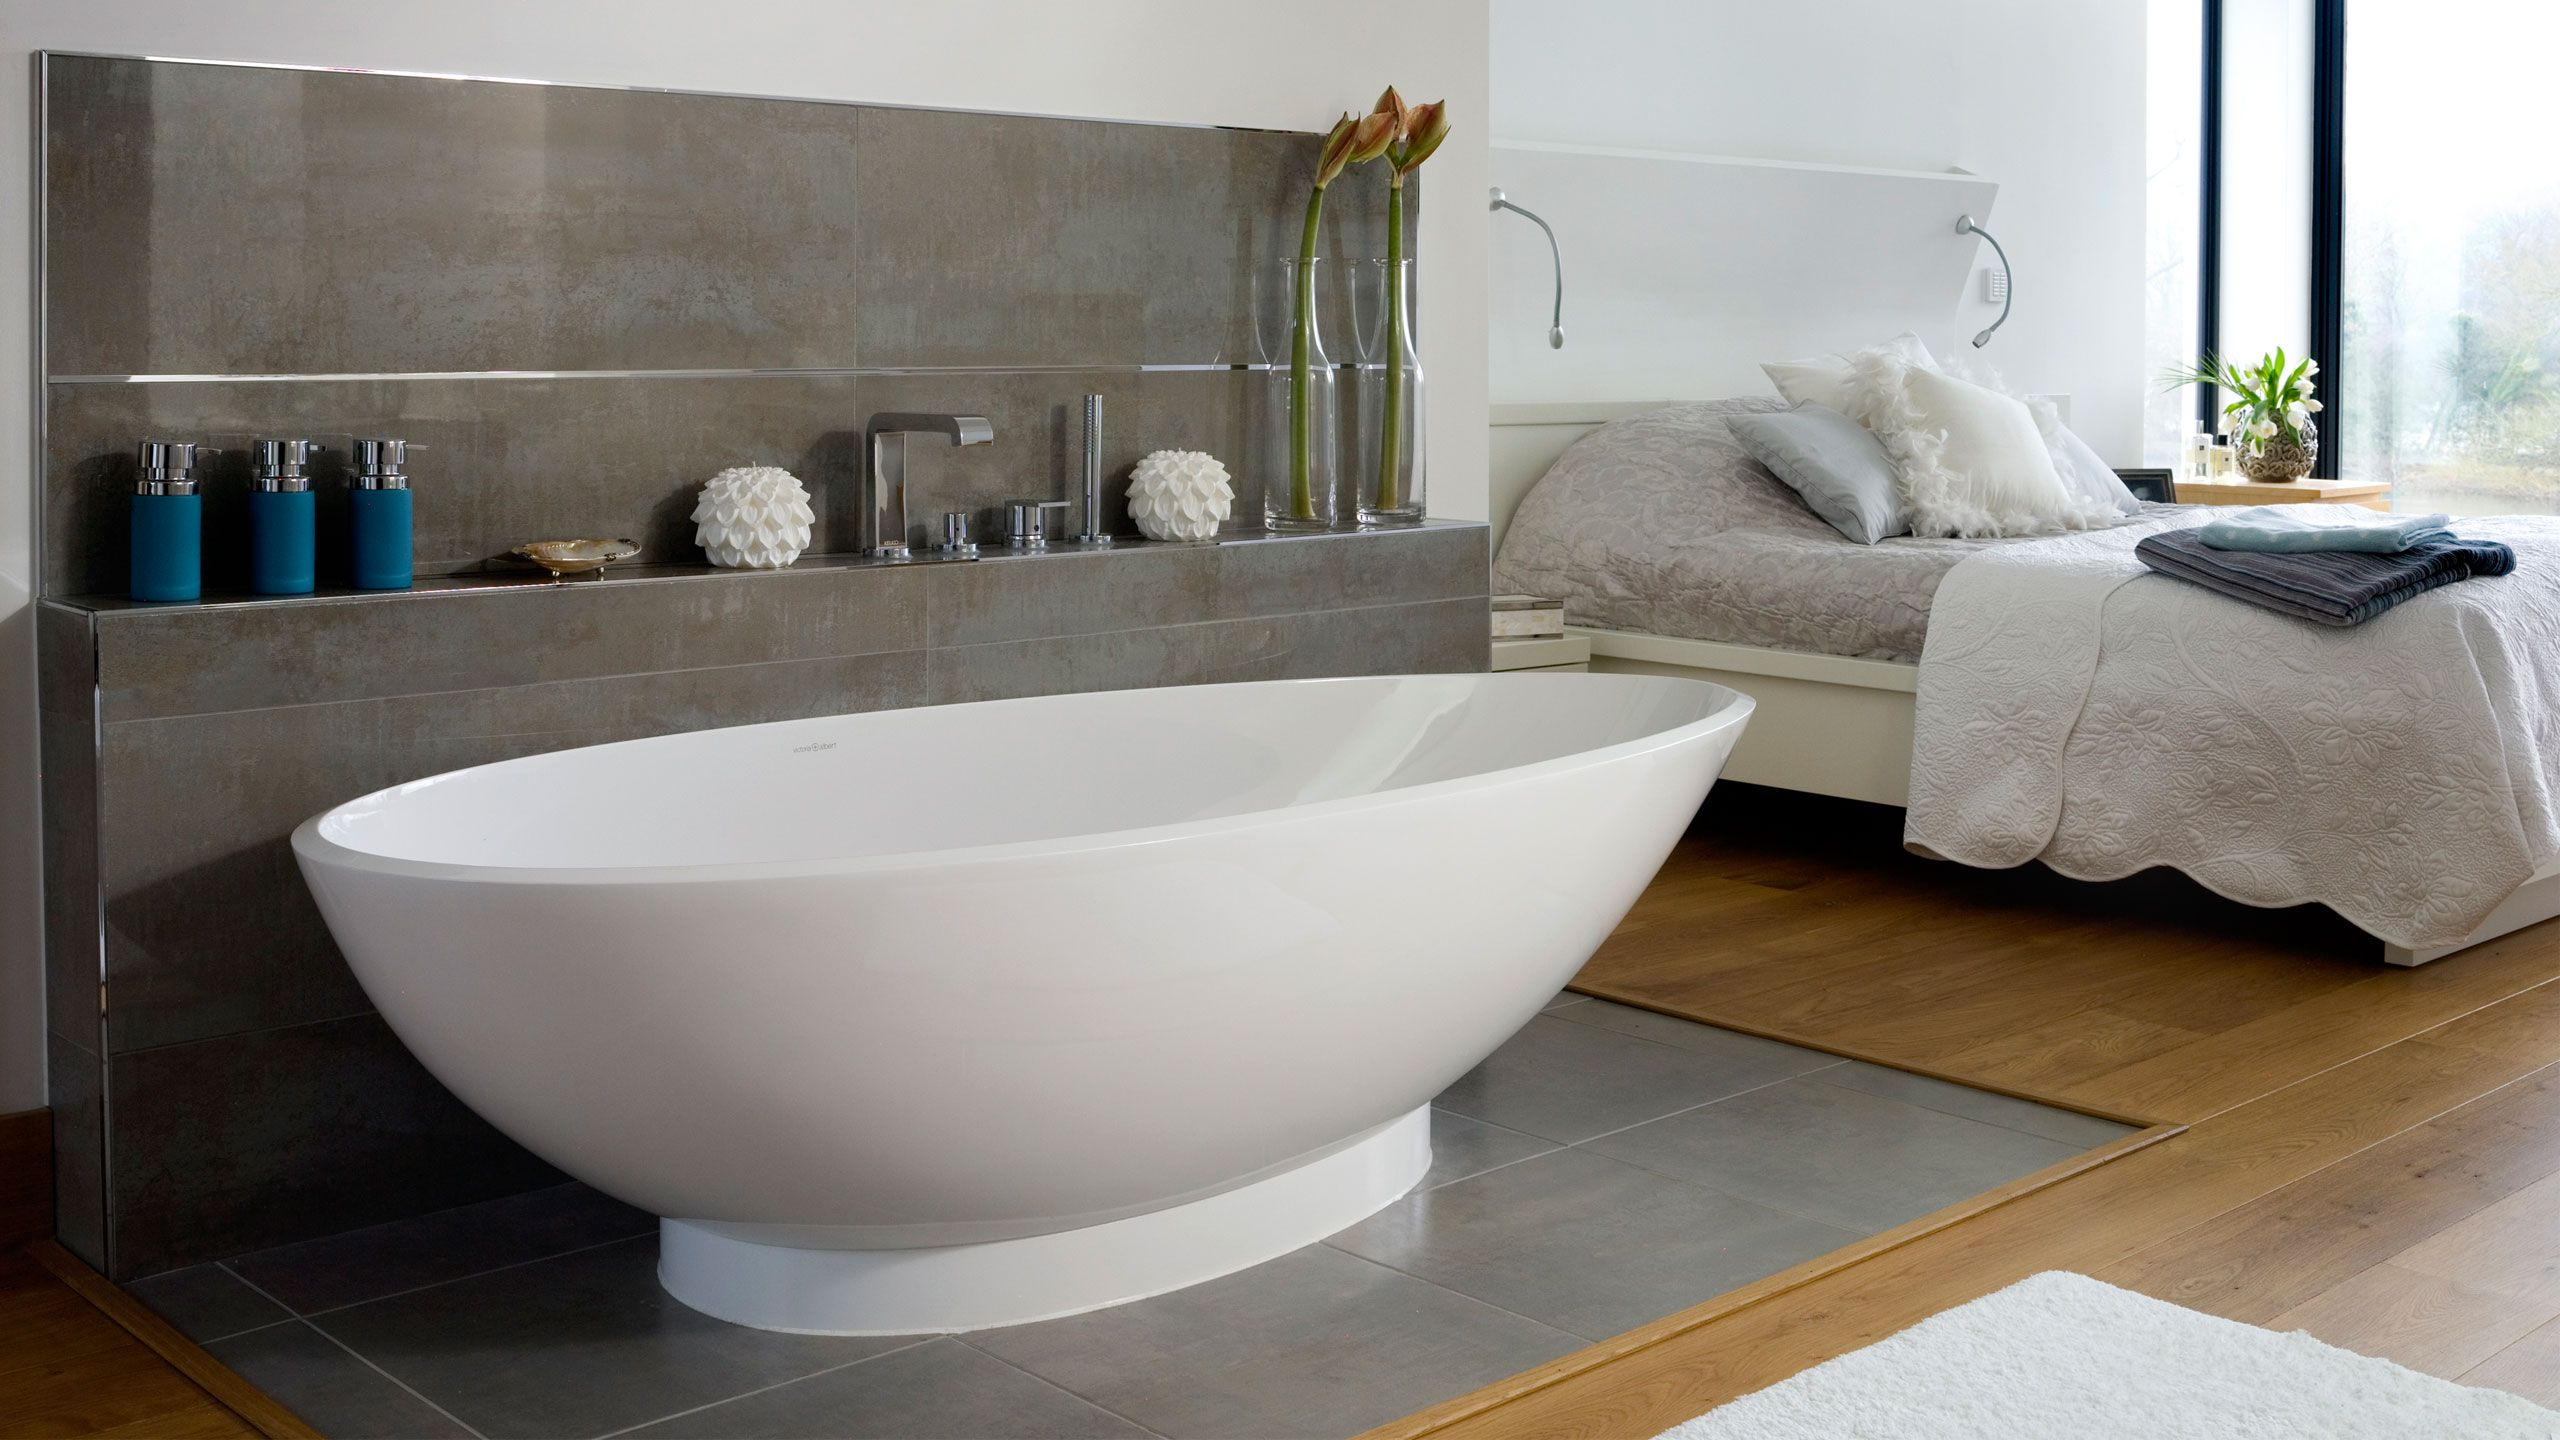 Napoli Bath by Victoria + Albert Baths | Sdb | Pinterest | Bath